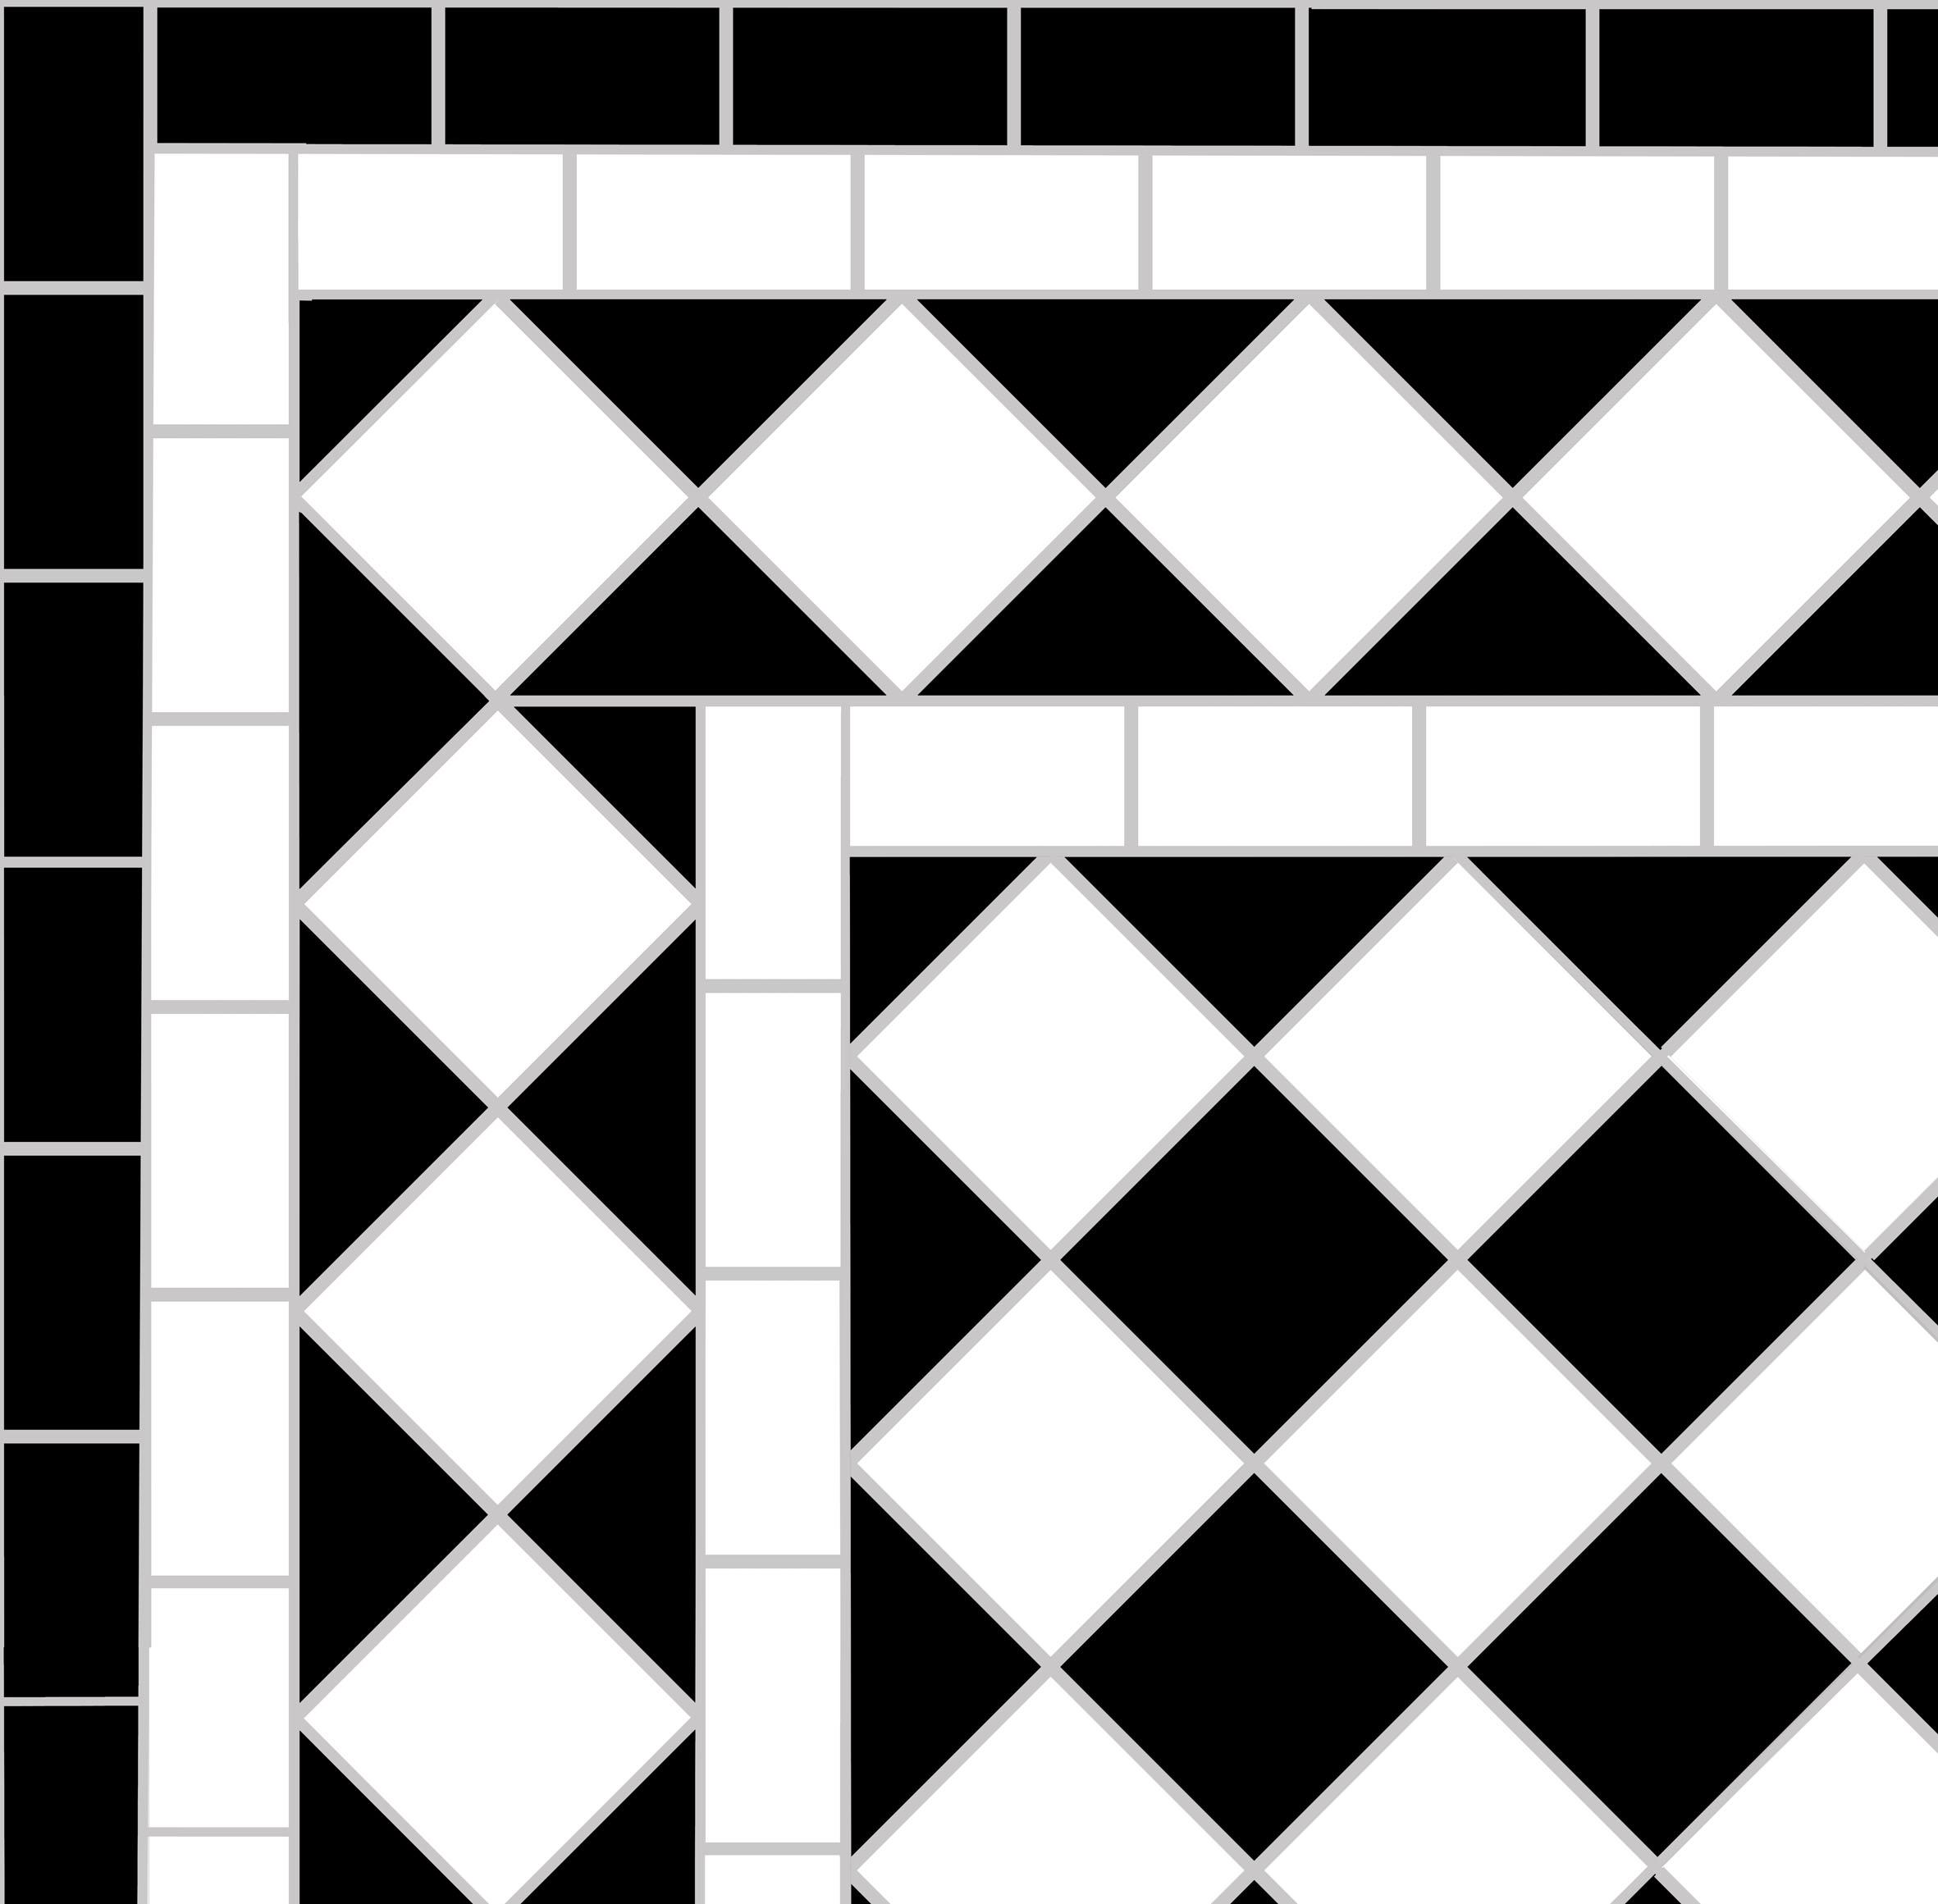 Victorian path tiles - black & white chequer with white diamond border